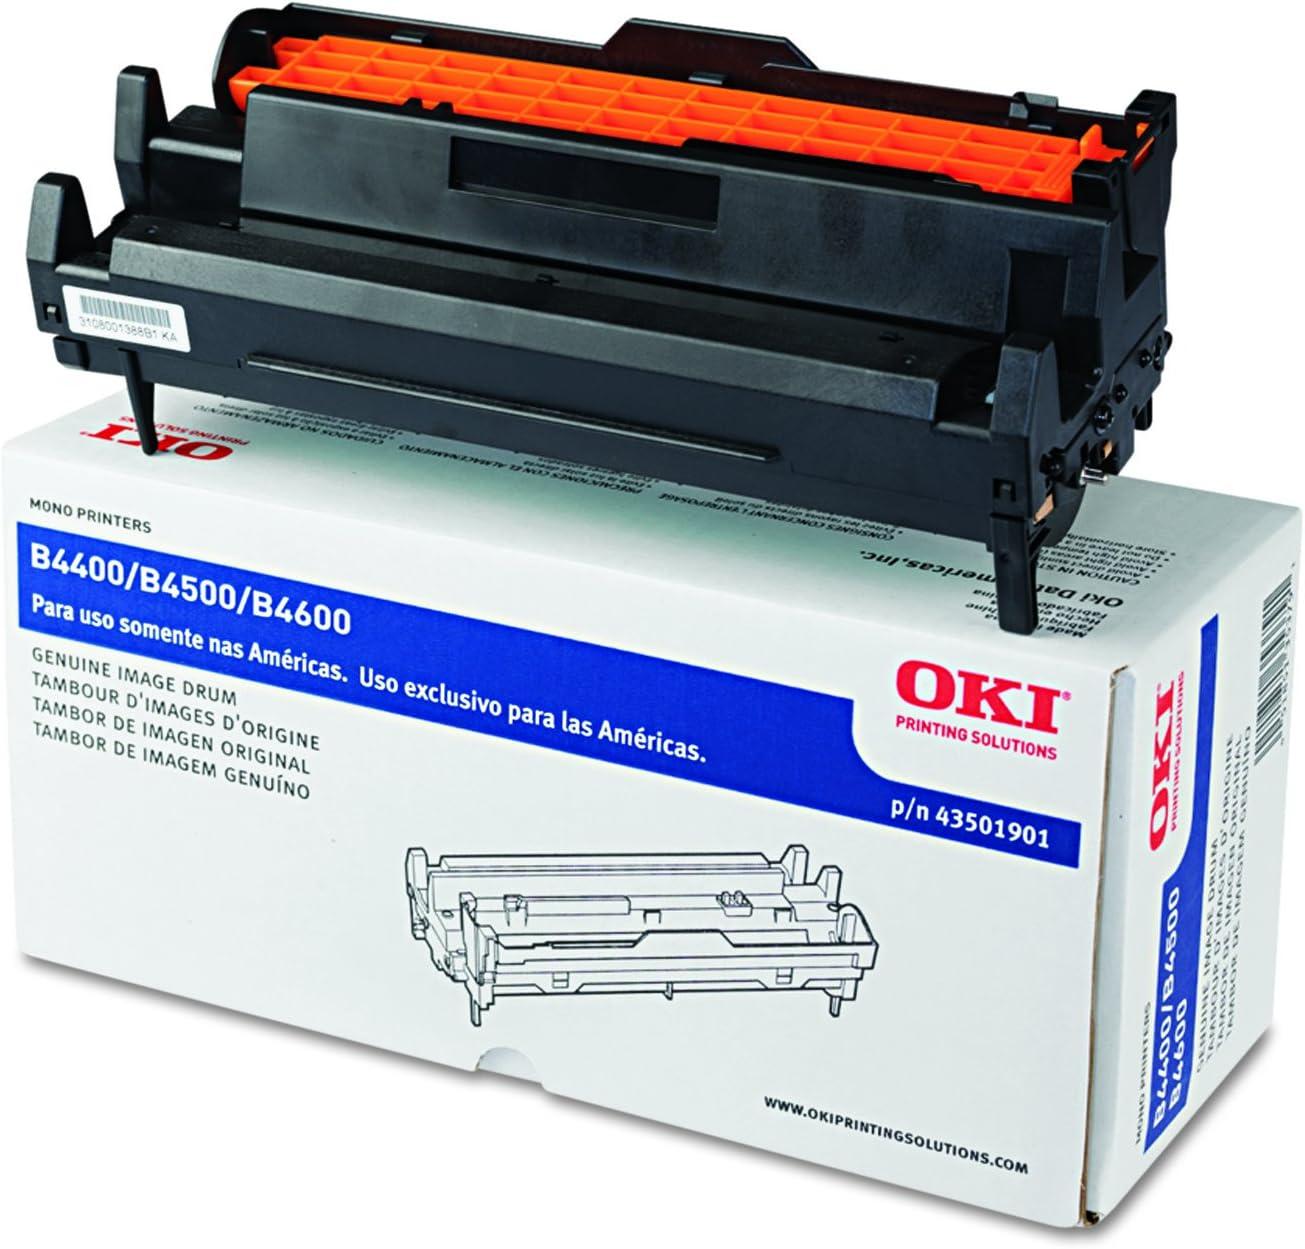 B4550 Works with: B4400 B4600 On-Site Laser Compatible Drum Replacement for Oki-Okidata 43501901 B4600N B4550N B4500 Black B4500N B4400N